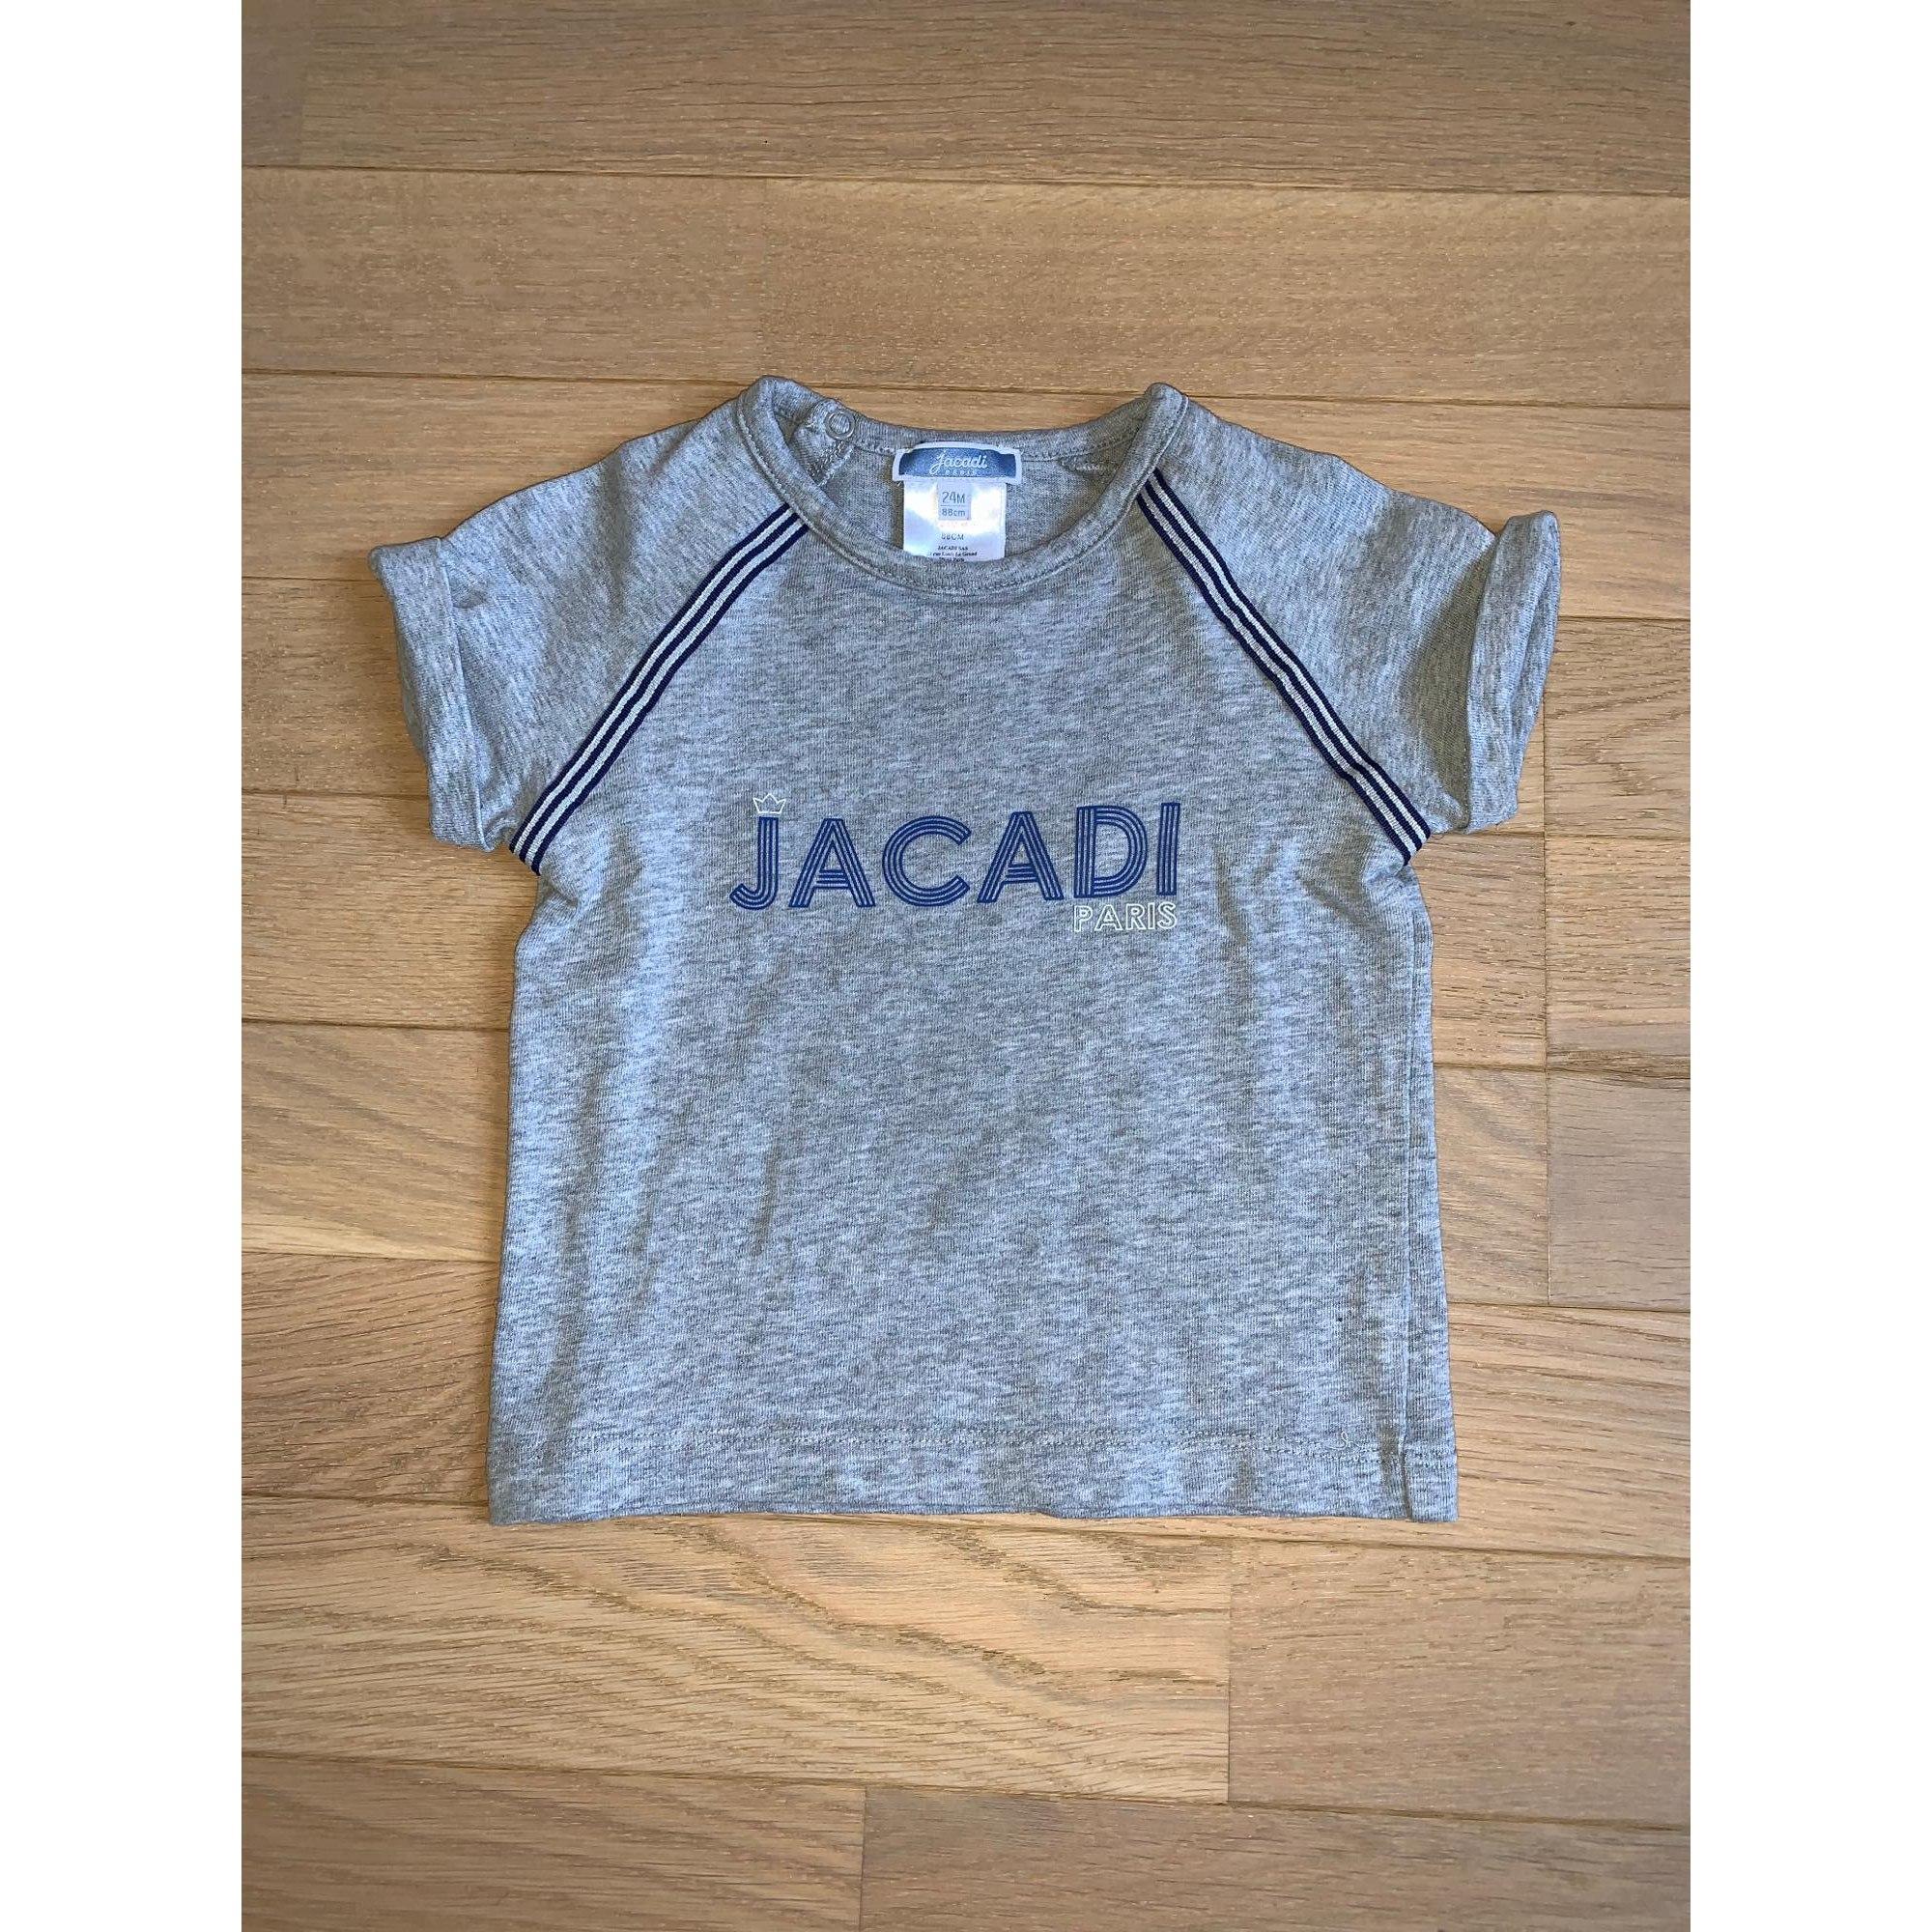 Top, tee shirt JACADI Gris, anthracite